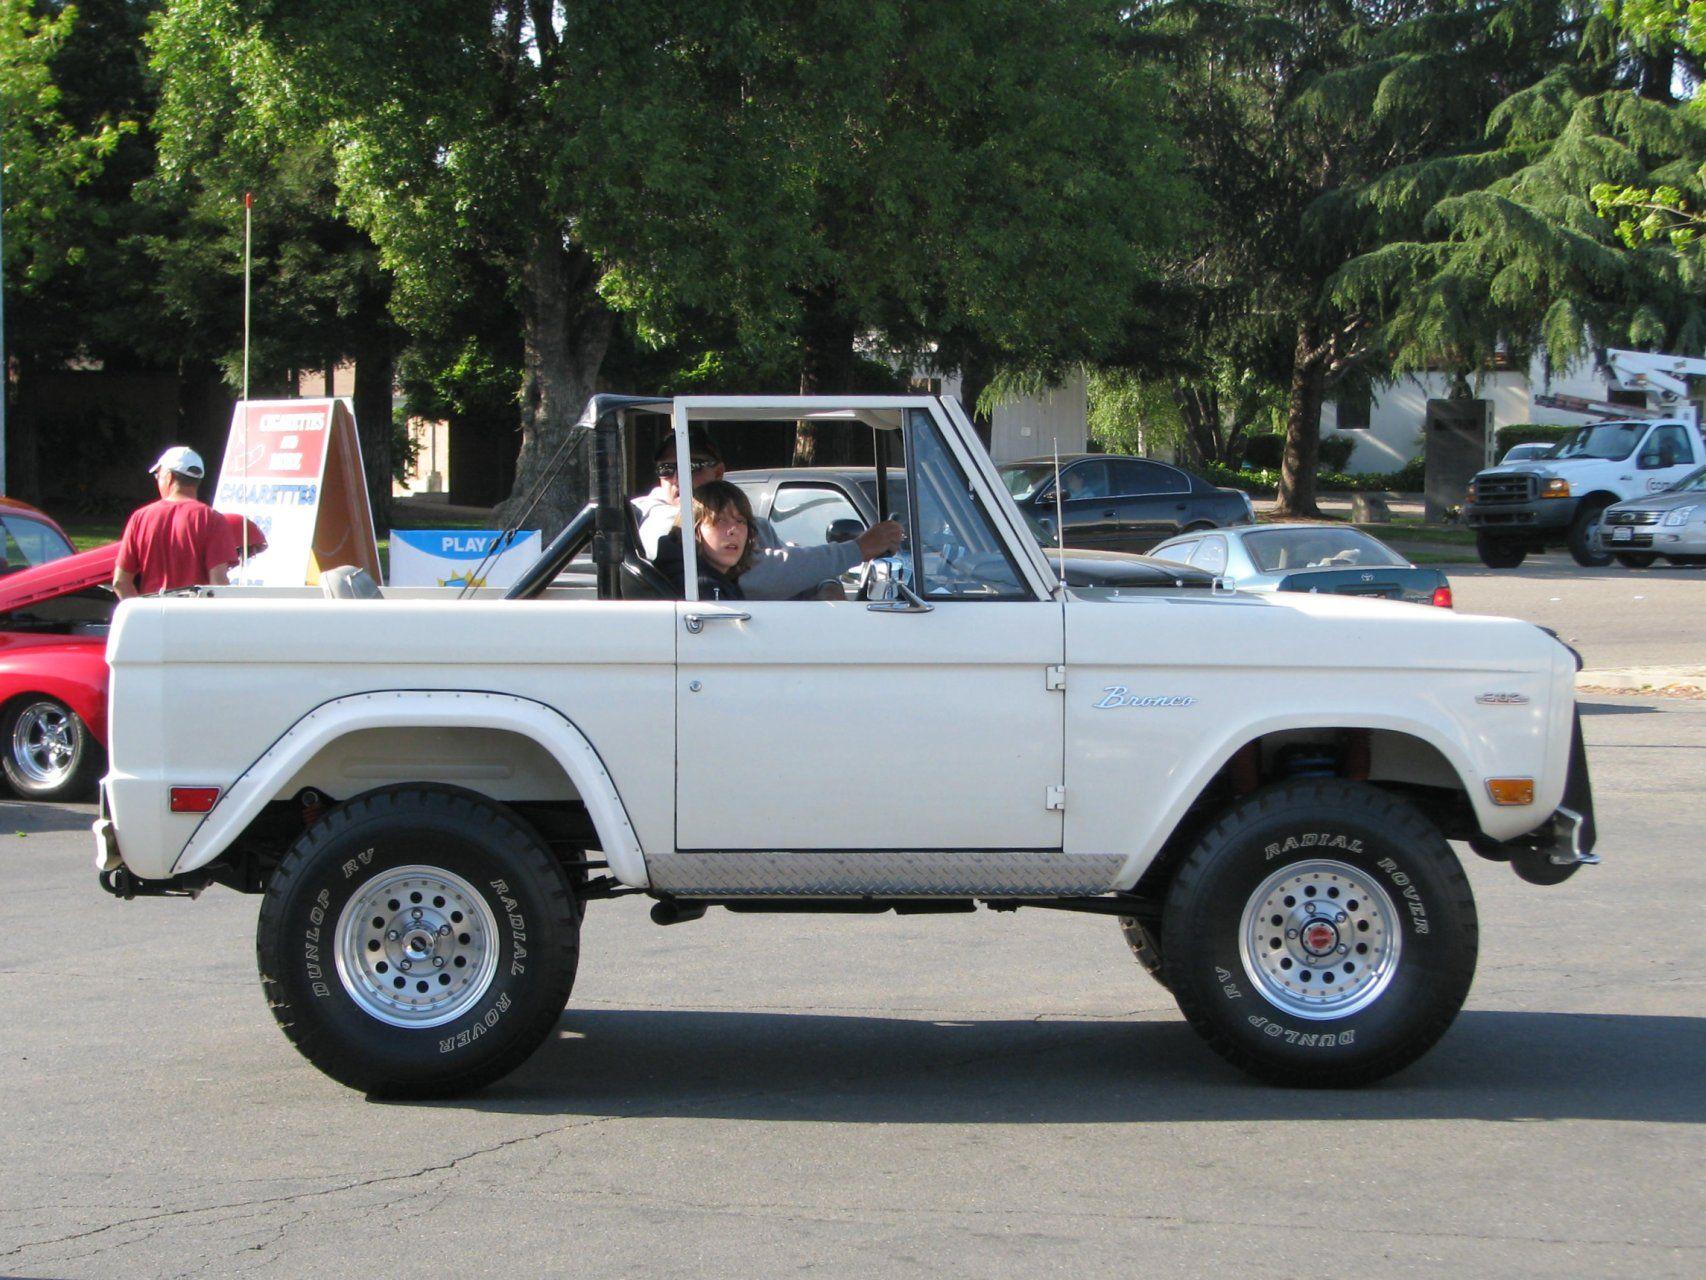 Vintage Ford Bronco | Ford Broncos are Back! | Pinterest | Ford ...